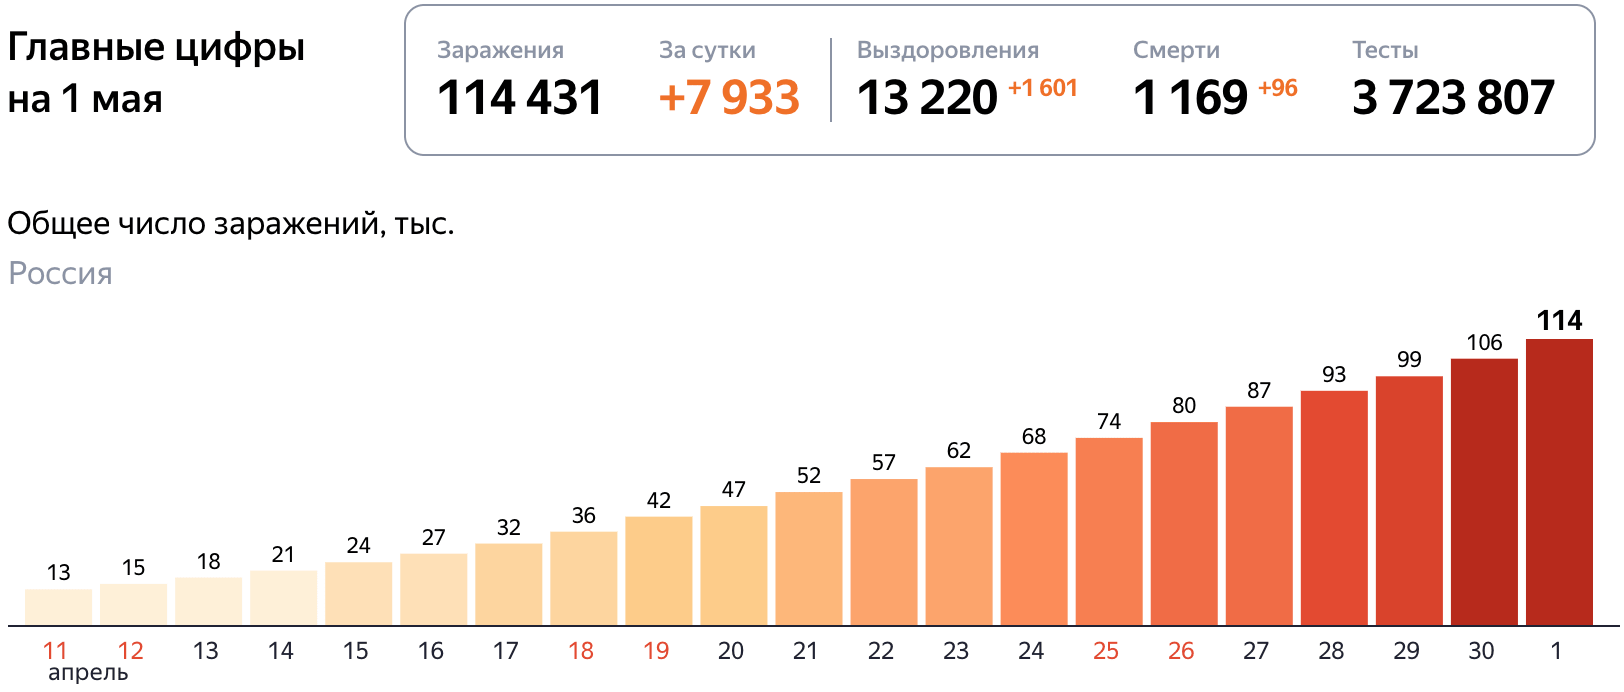 Короновирус статистика в России 2 мая 2020 год